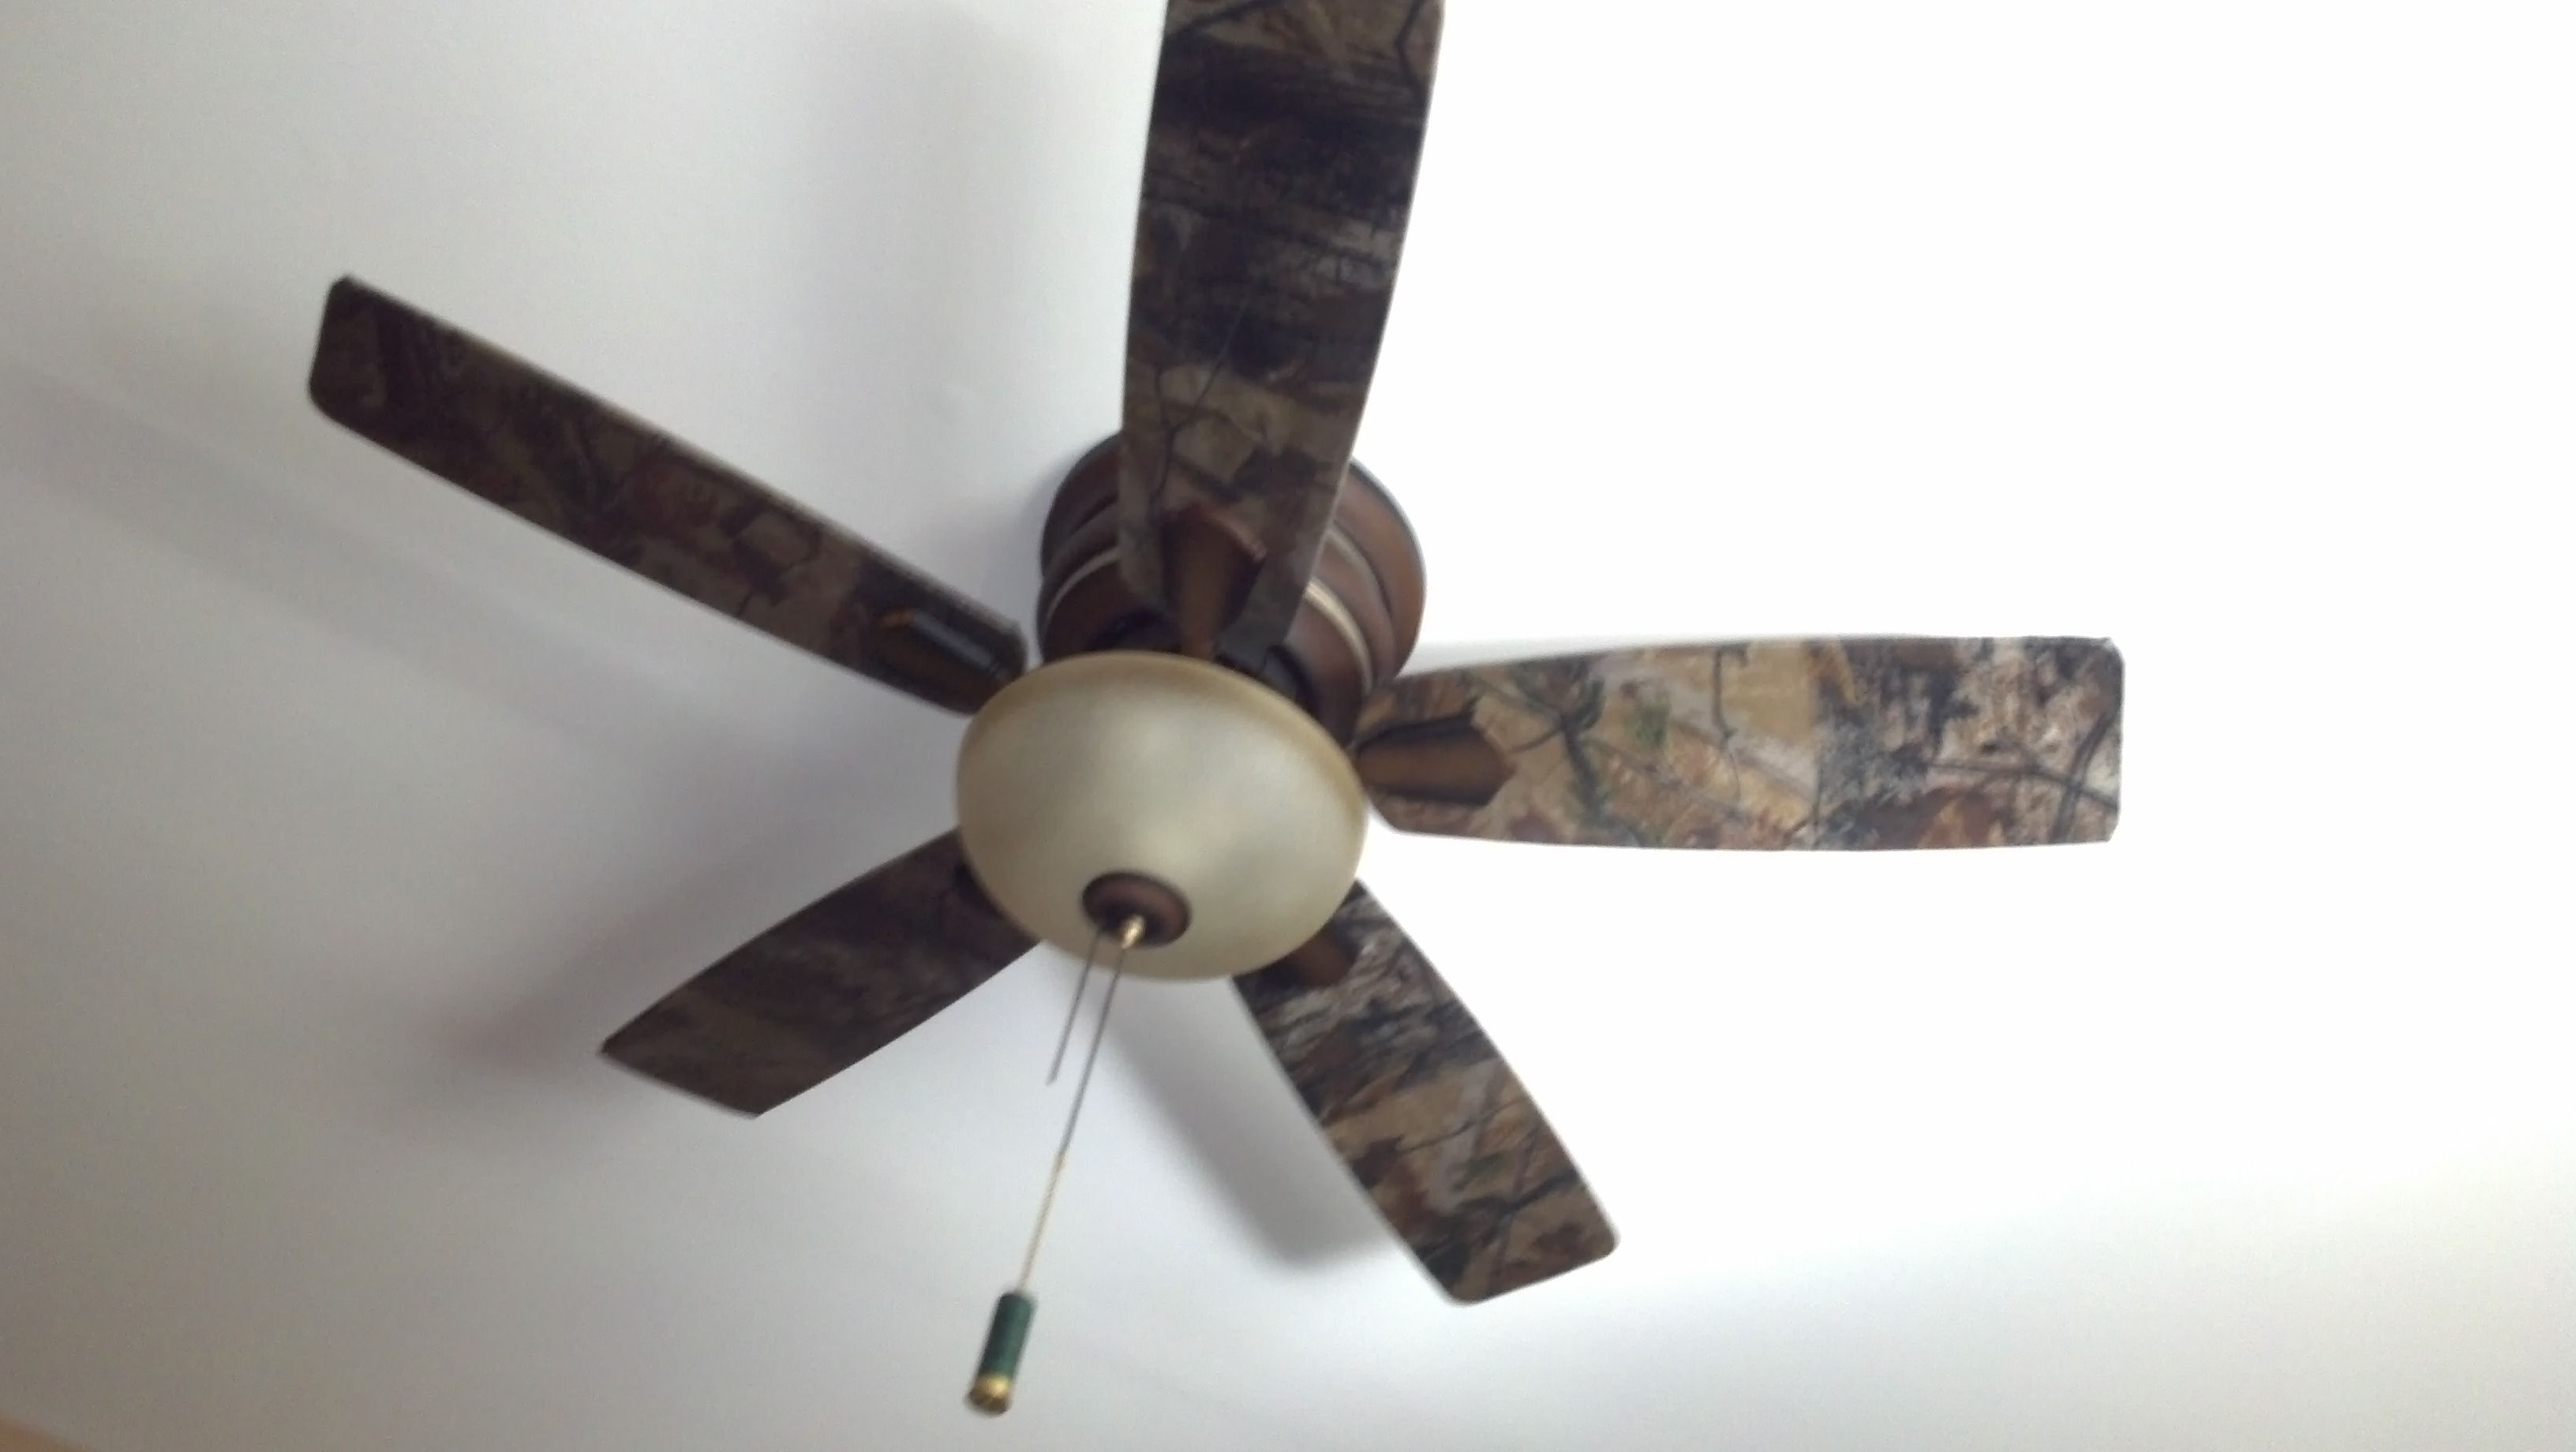 Finished fan modge podged camo fabric onto ceiling fan blades finished fan modge podged camo fabric onto ceiling fan blades aloadofball Gallery